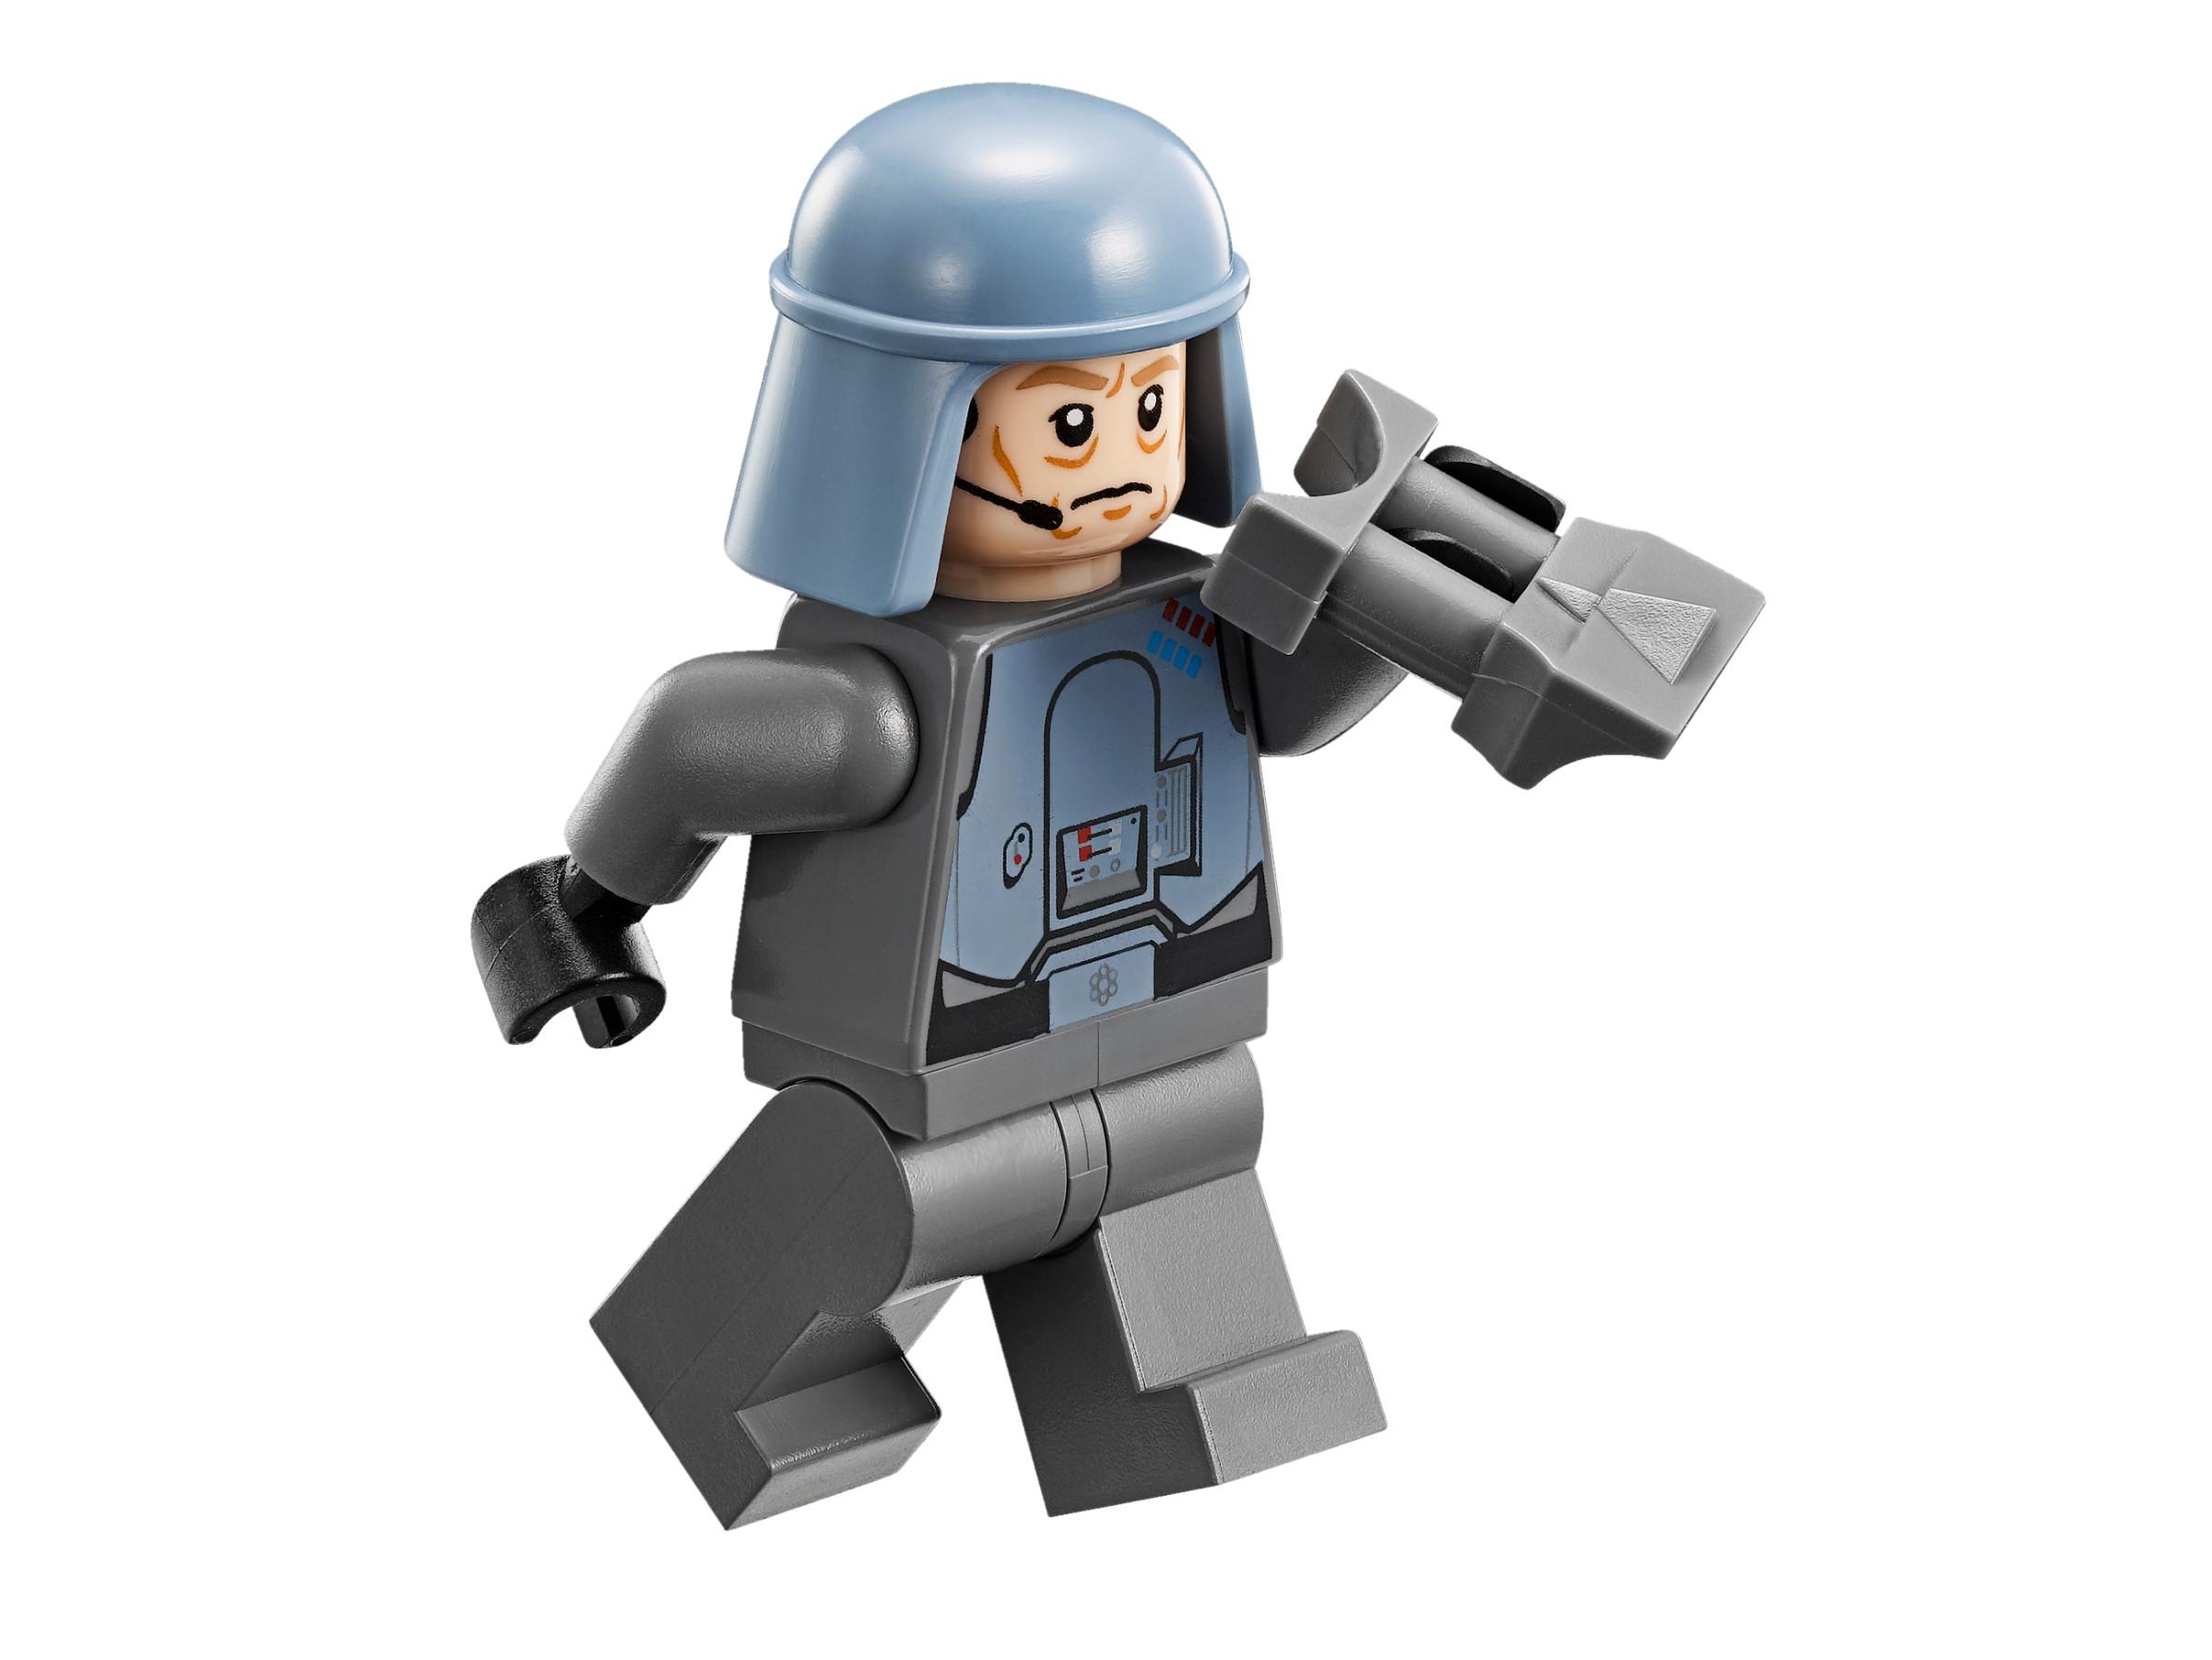 Lego star wars 75054 at at - Croiseur star wars lego ...